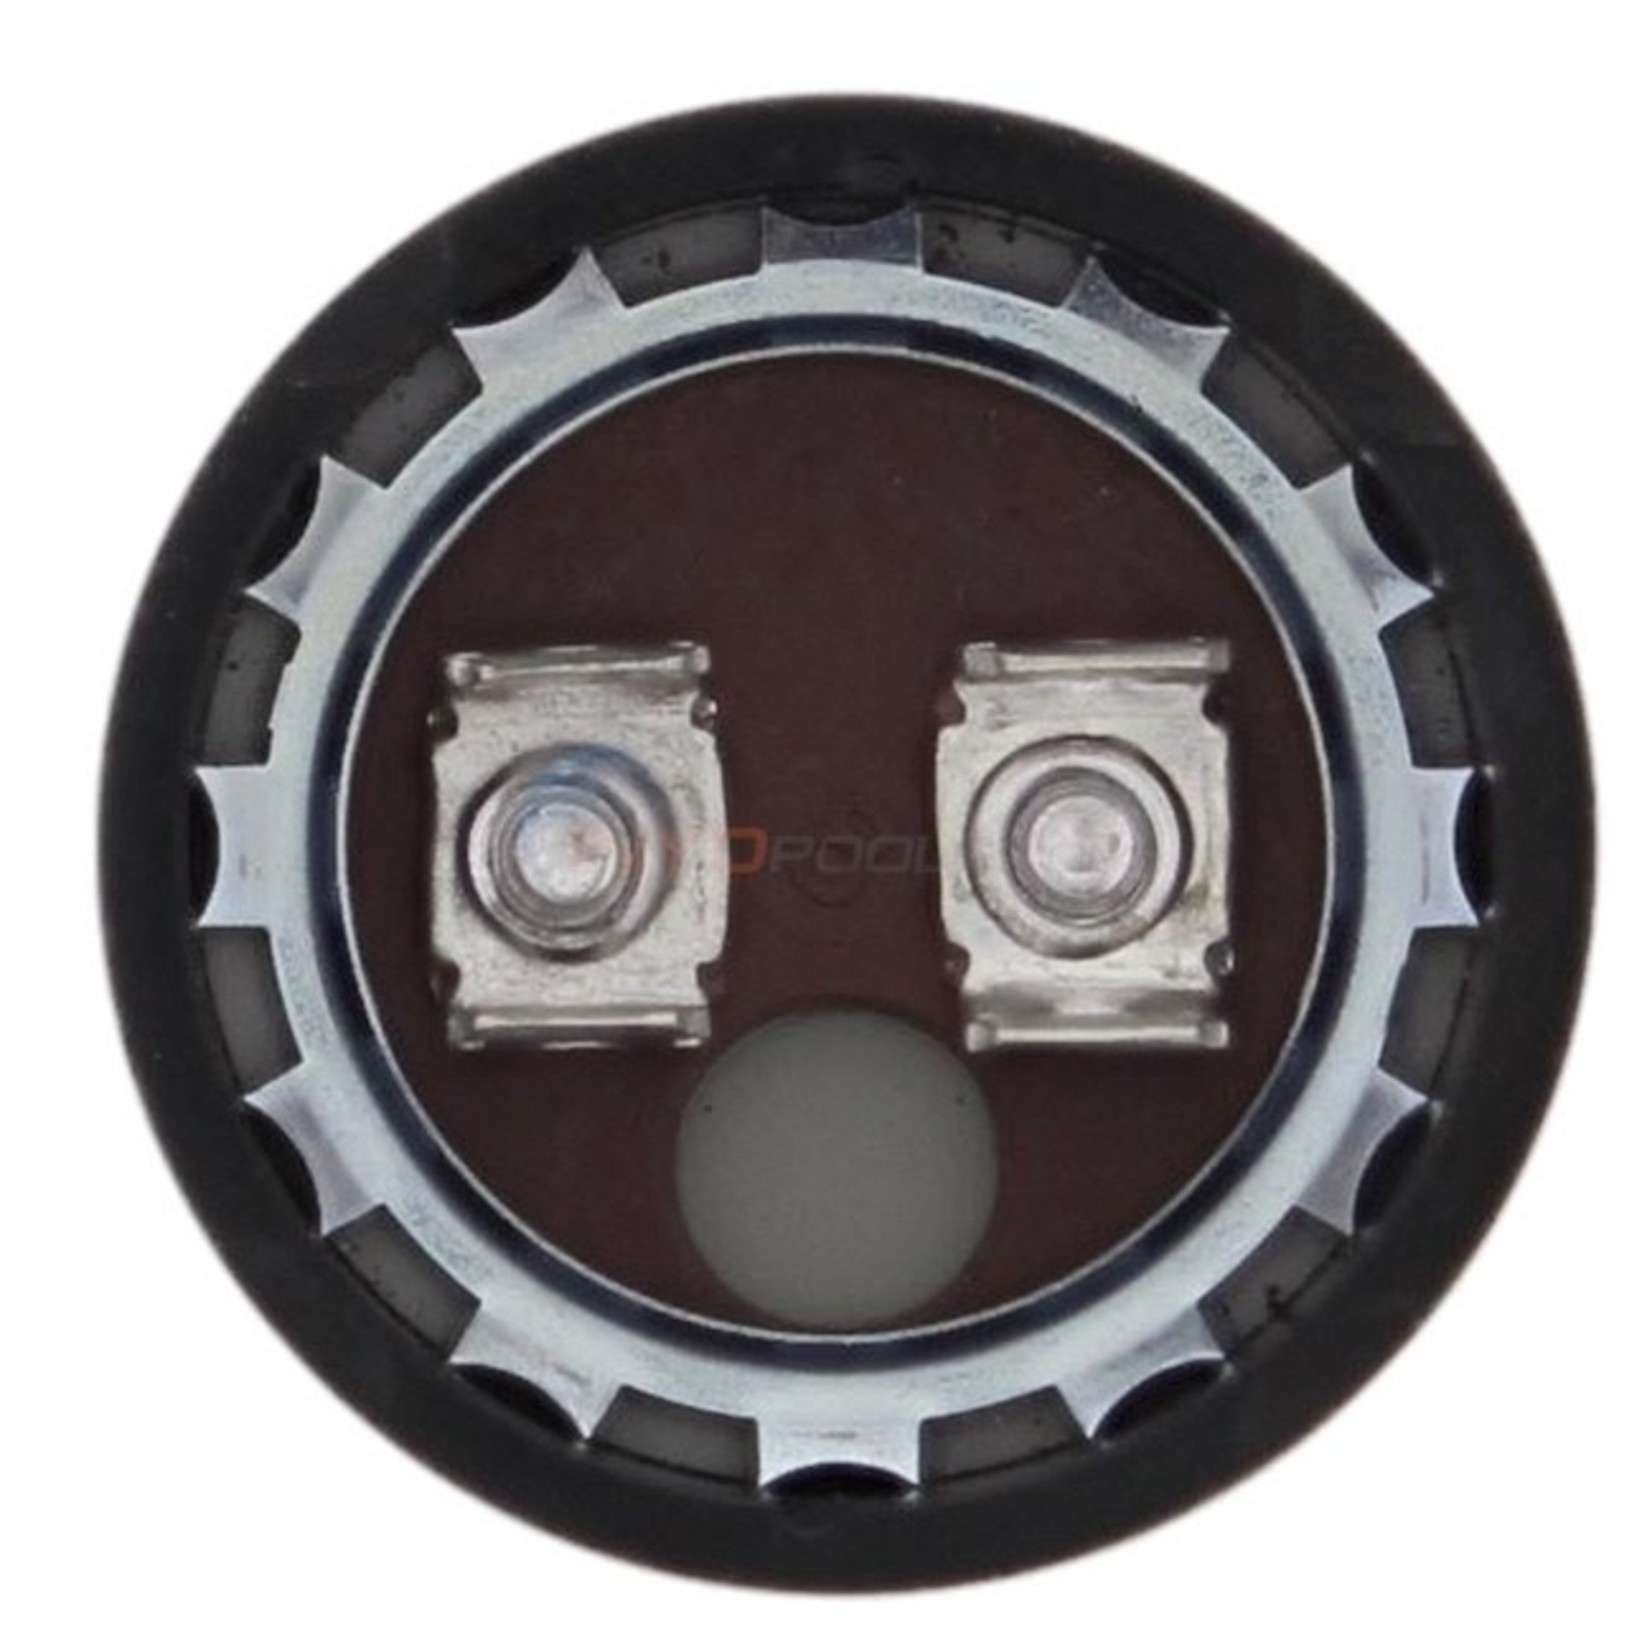 CAPACITOR HAYWARD SUPER PUMP 161-193 MFD